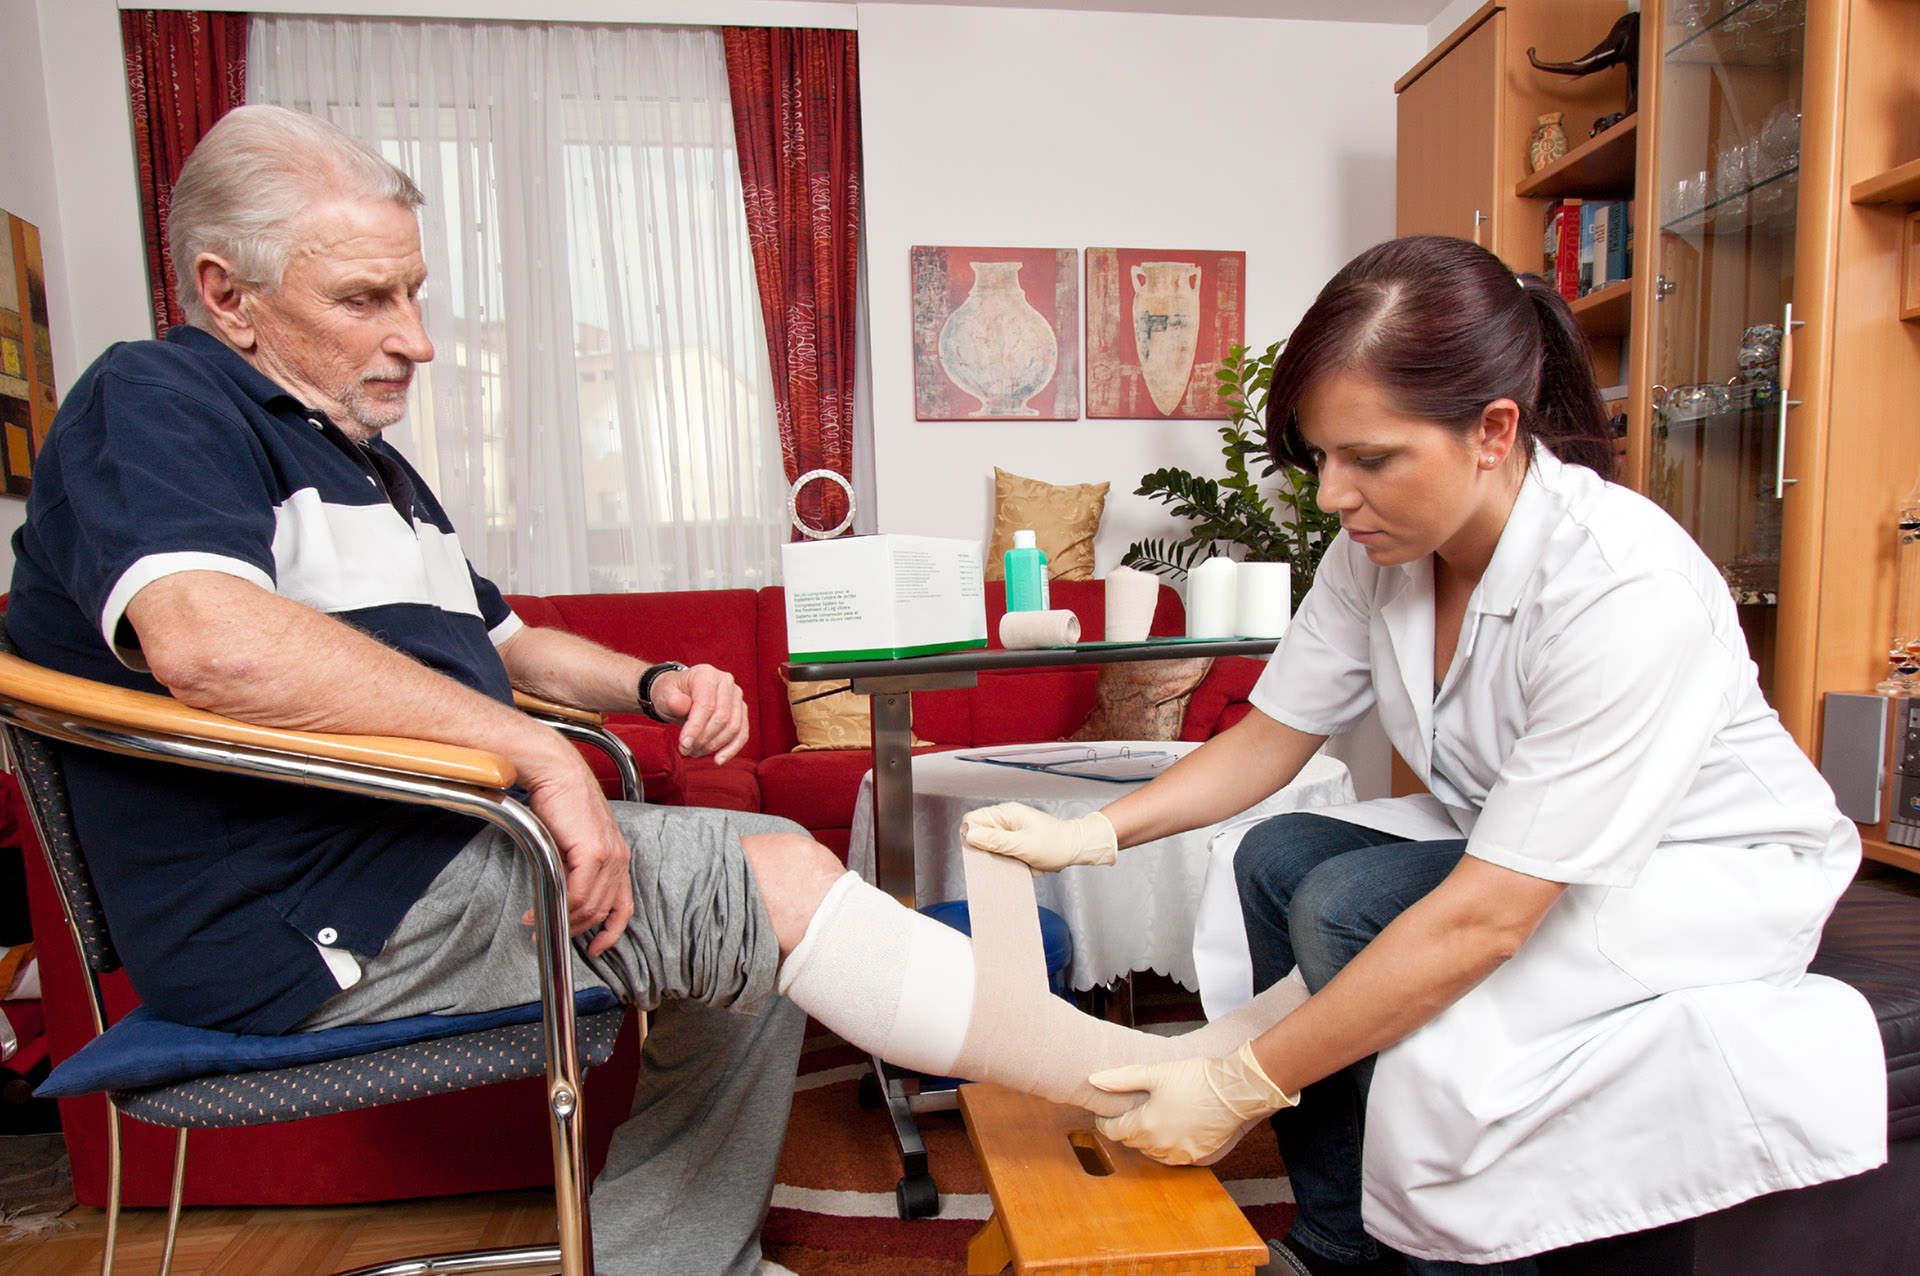 Wound care by caregiver nurses